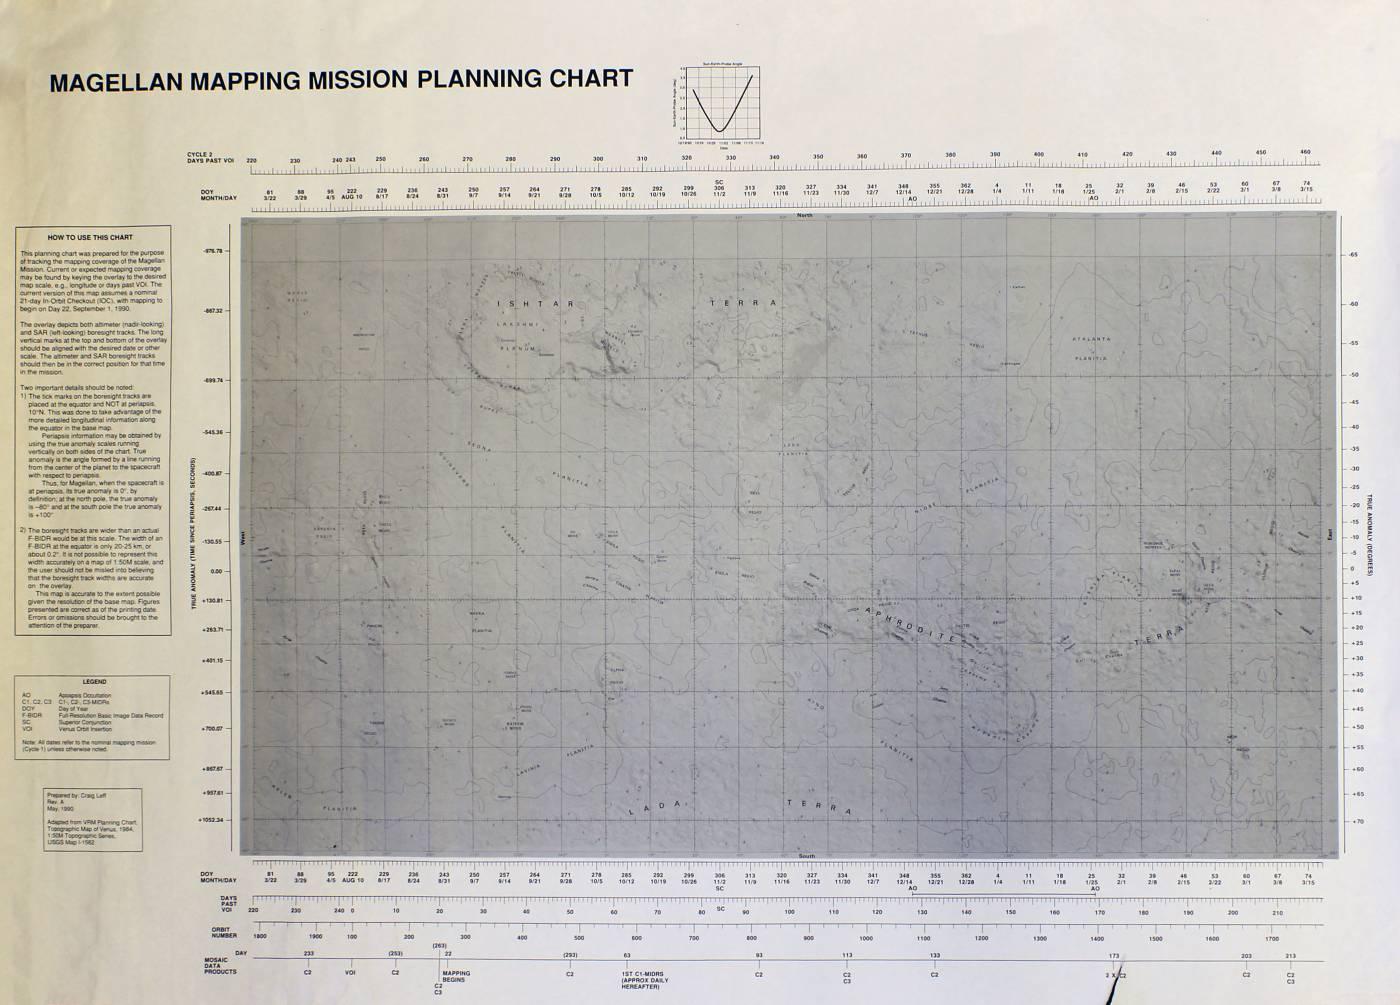 Magellan planning chart…